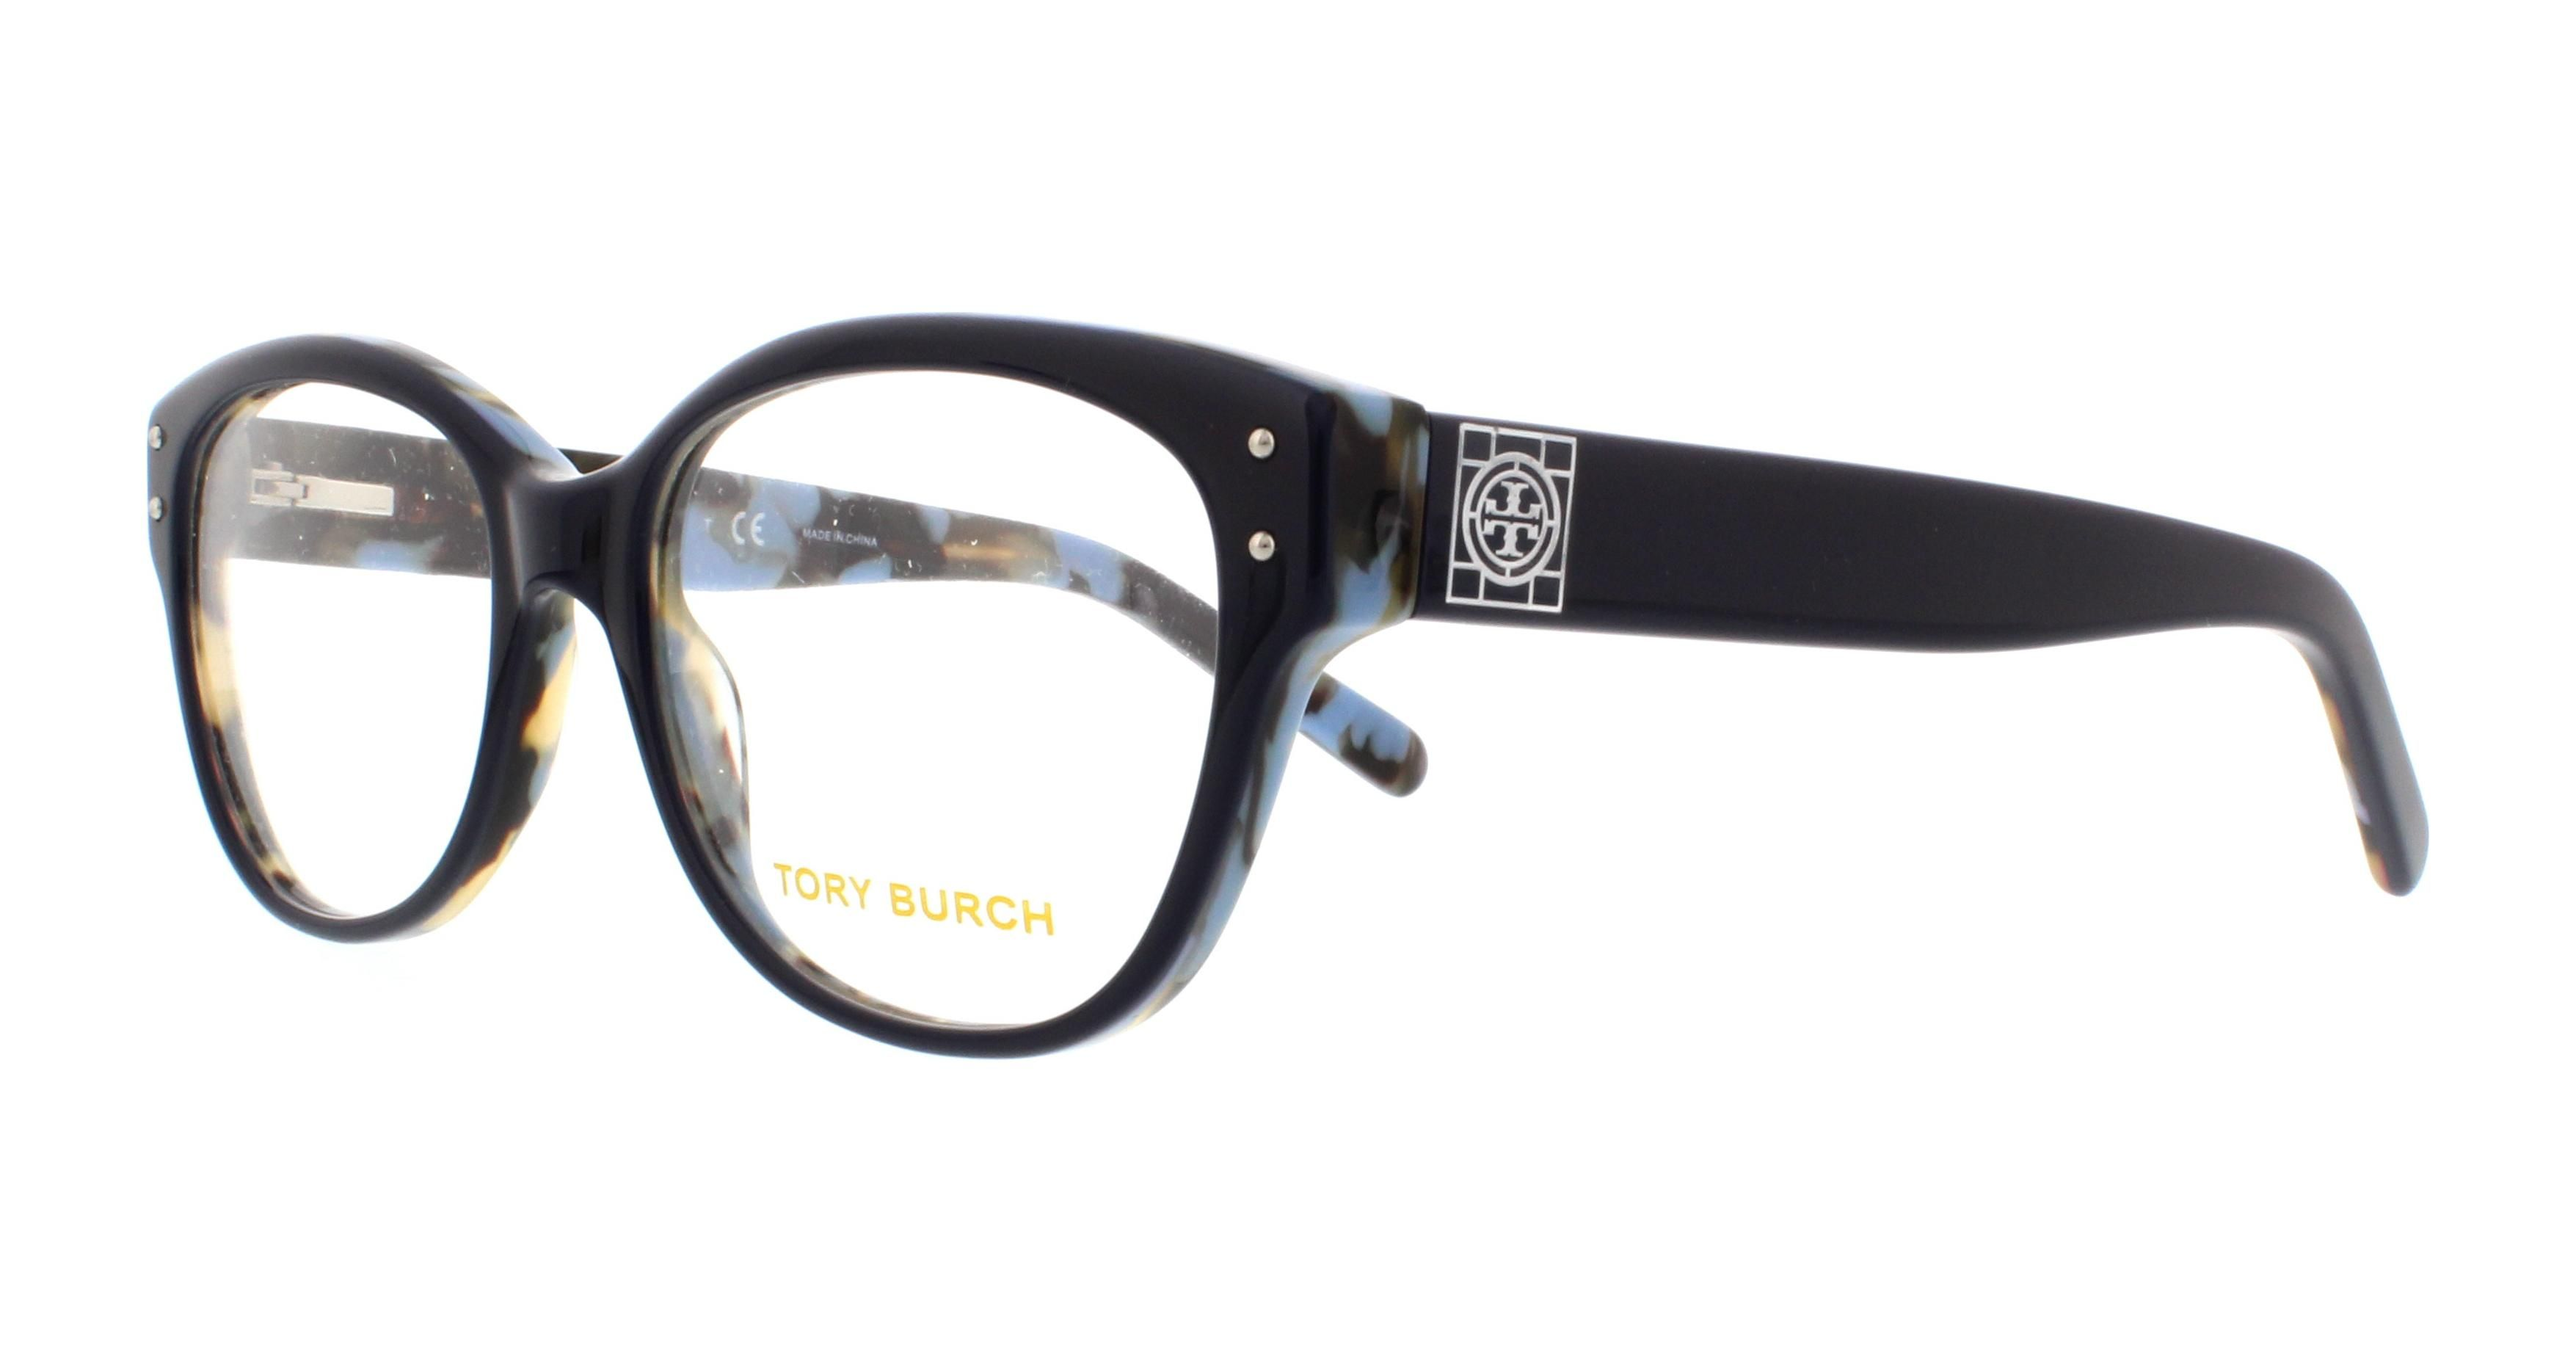 Pin on Eyeglasses I like!